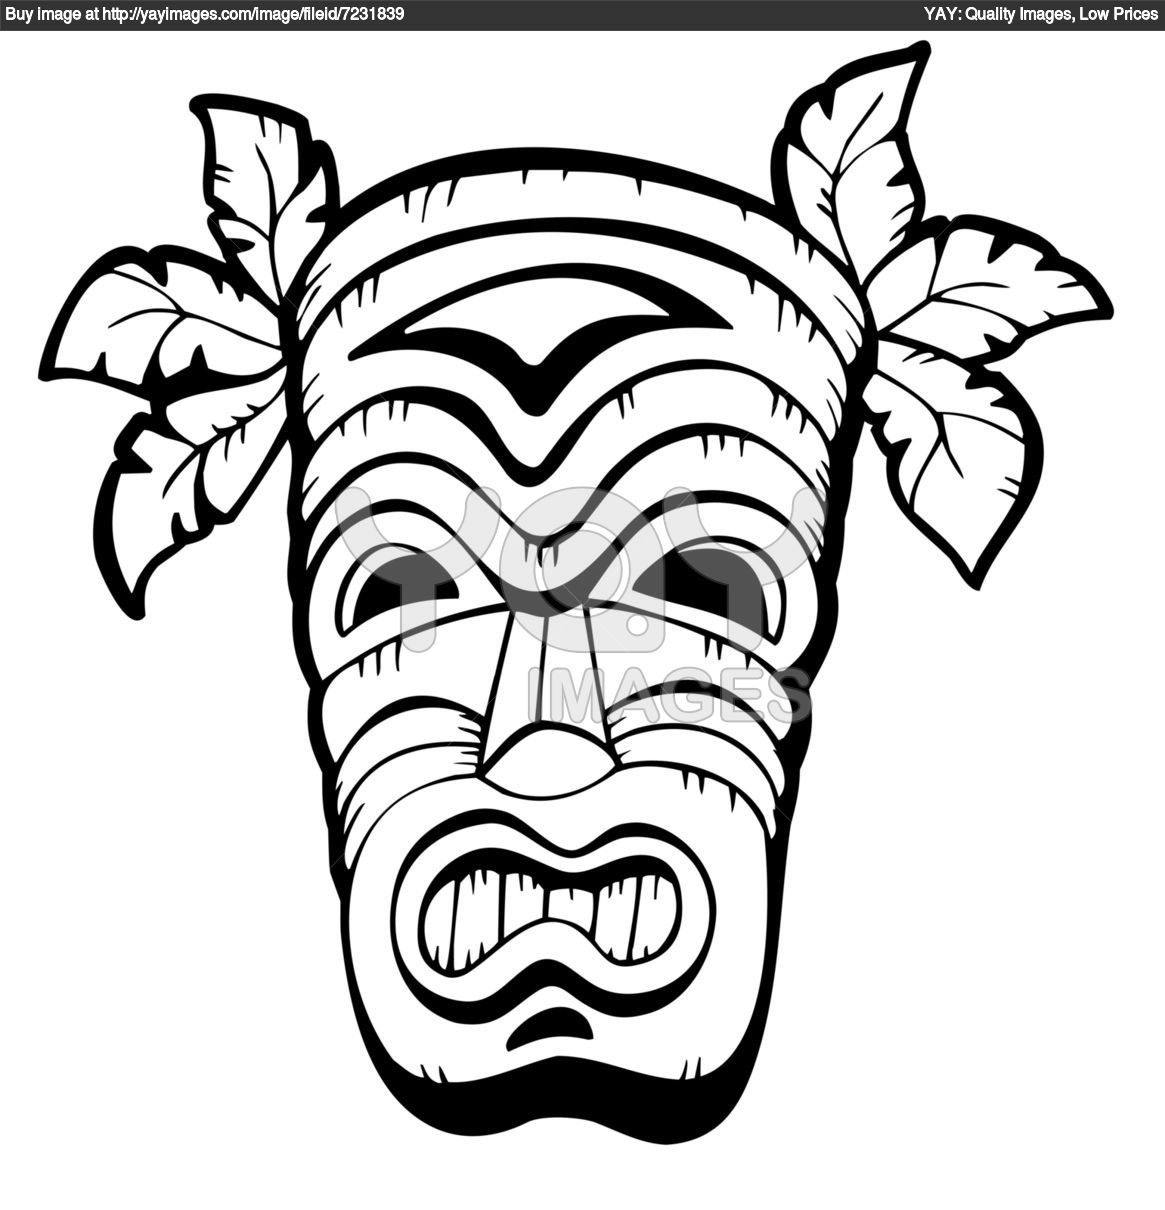 Hawaii Coloring Pages To Print Printable Hawaiian Coloring Pages